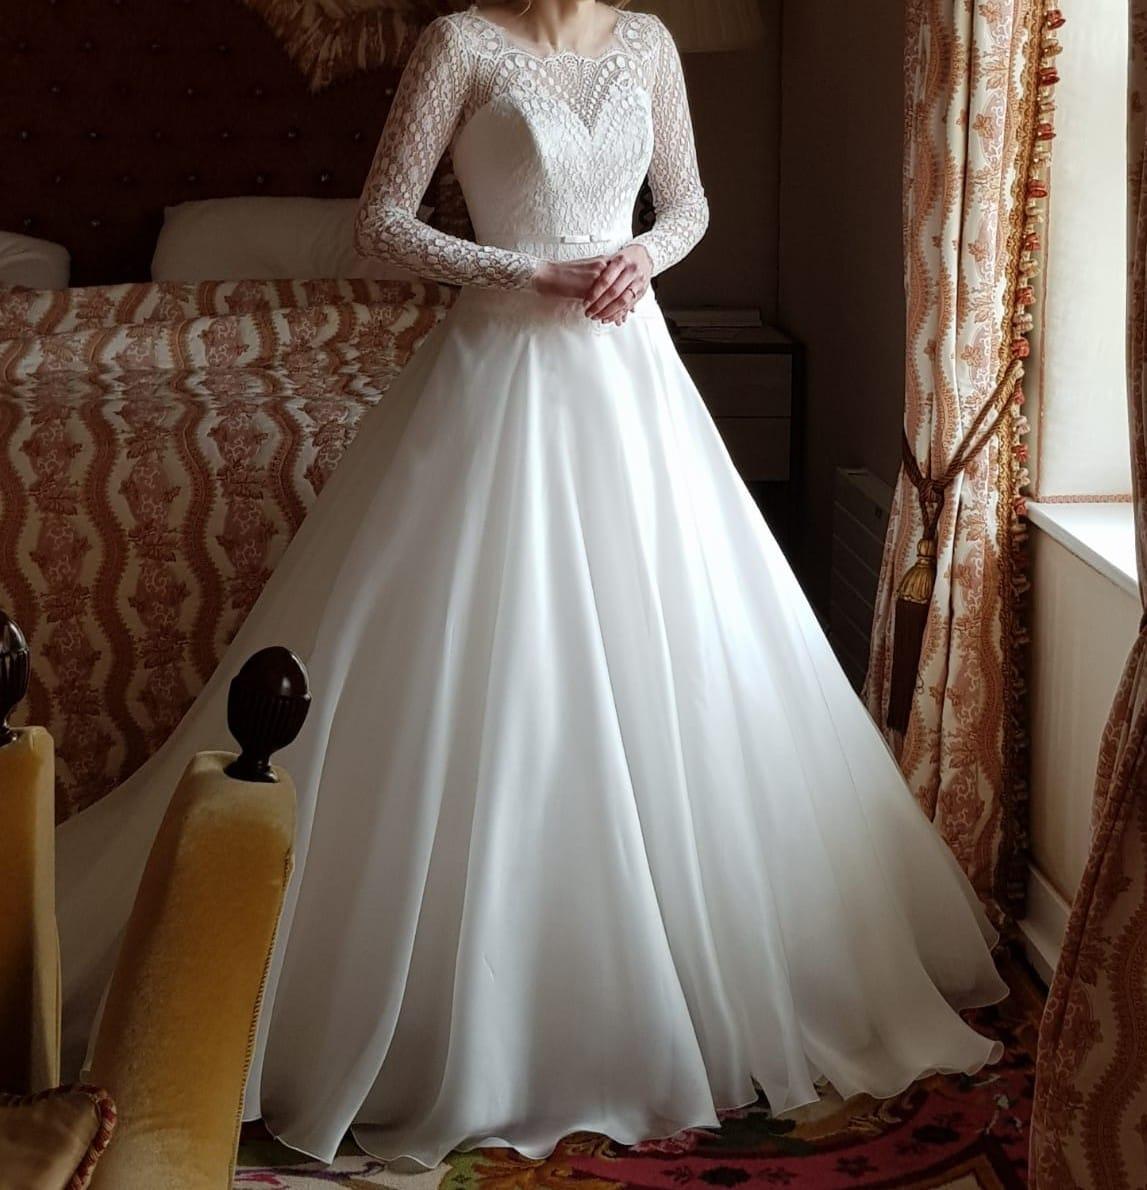 Suzanne Neville Clarice – Beautiful lace wedding dress